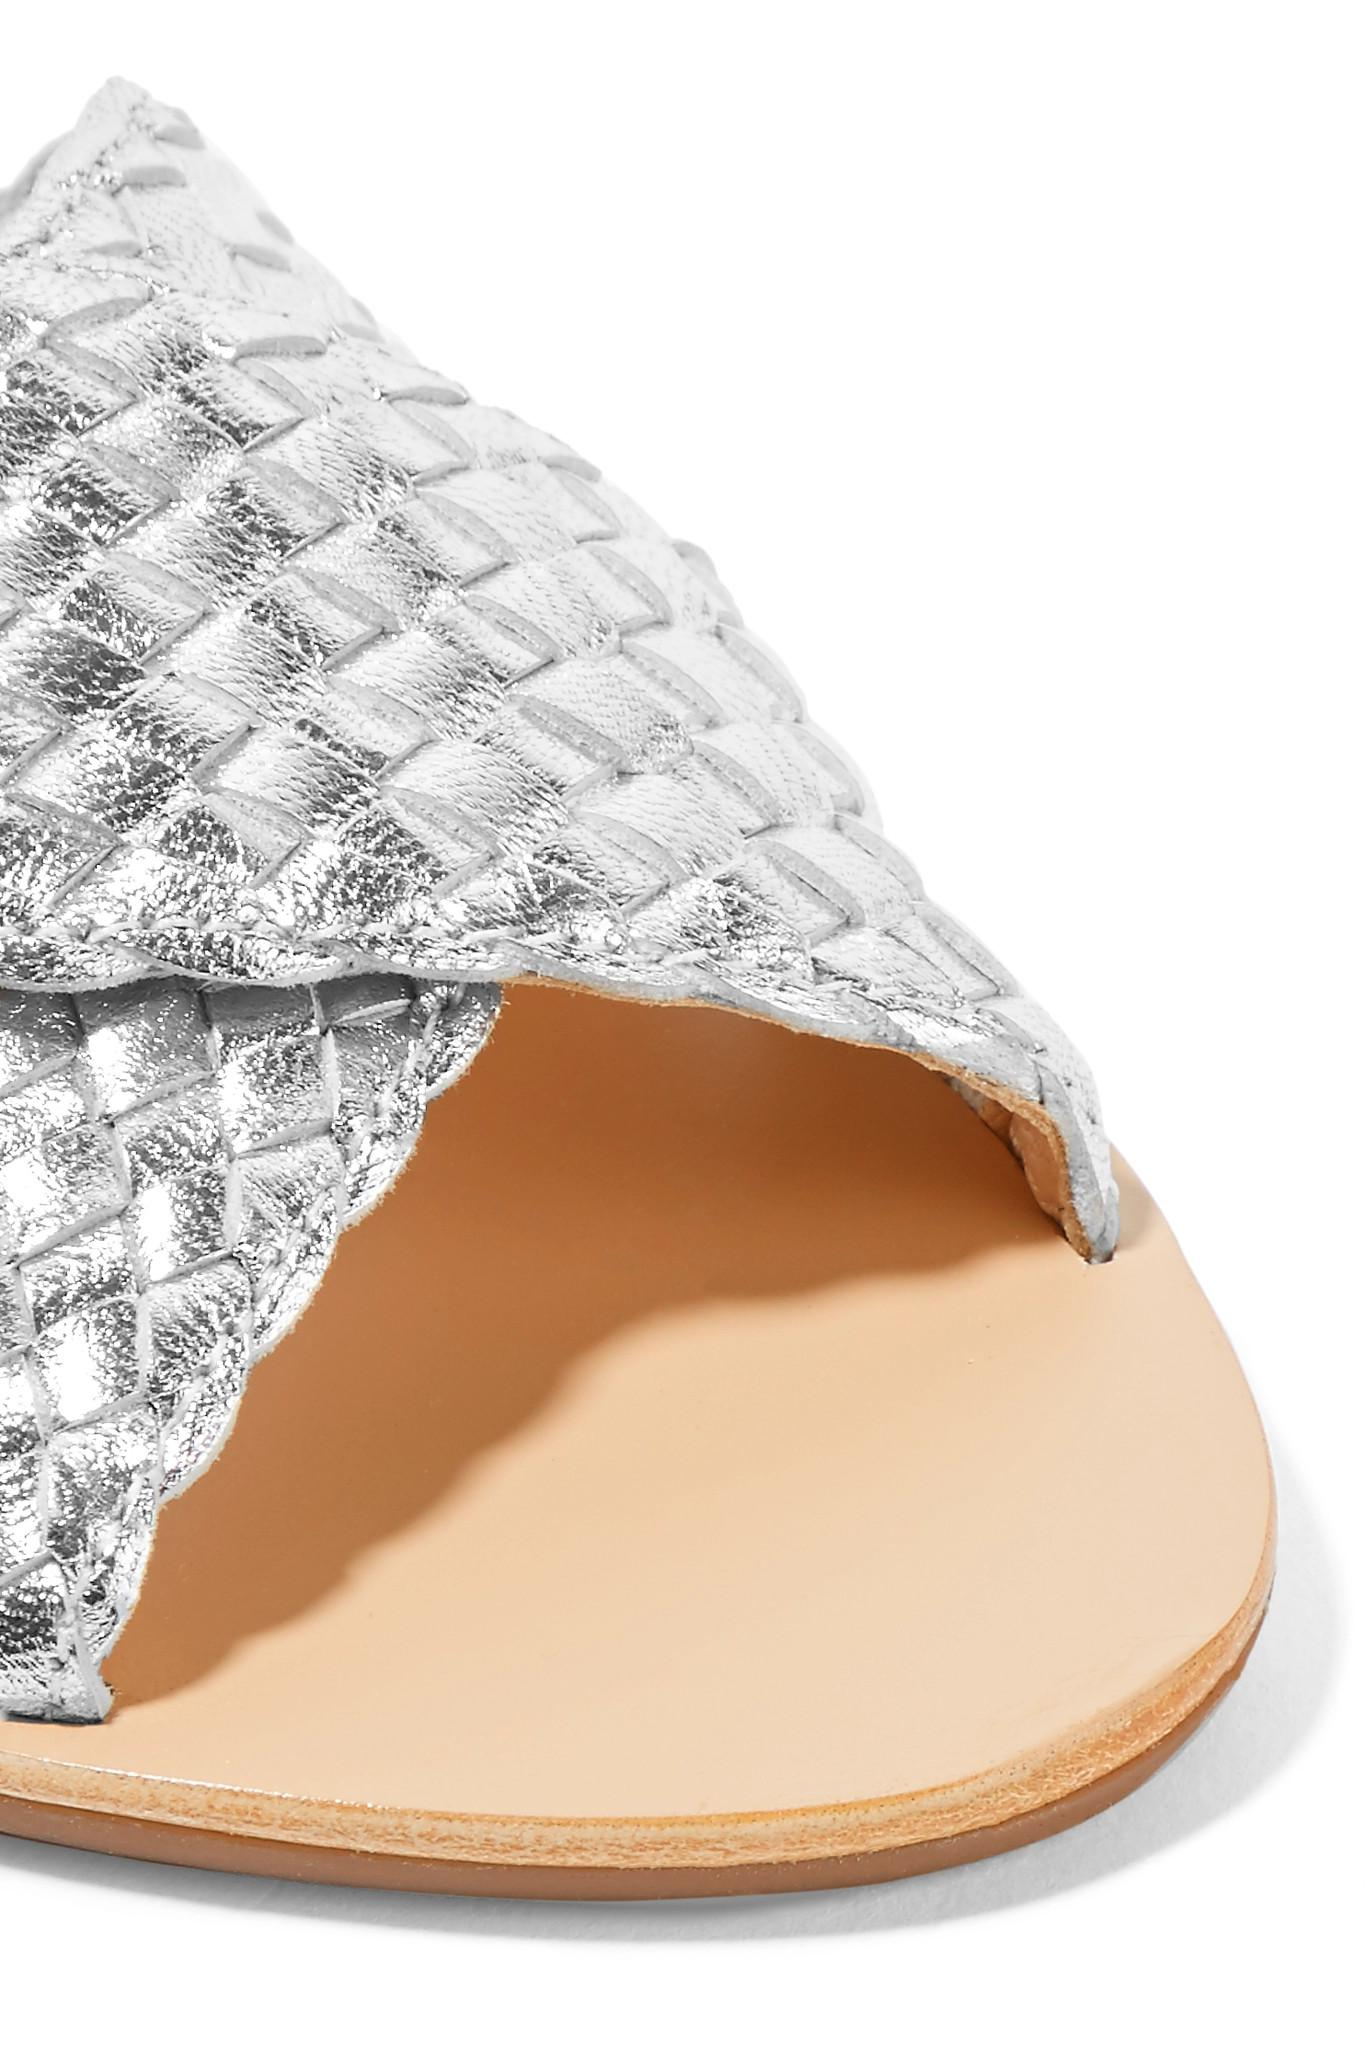 b70b78e01f41 Loeffler Randall - Claudie Woven Metallic Leather Slides - Lyst. View  fullscreen